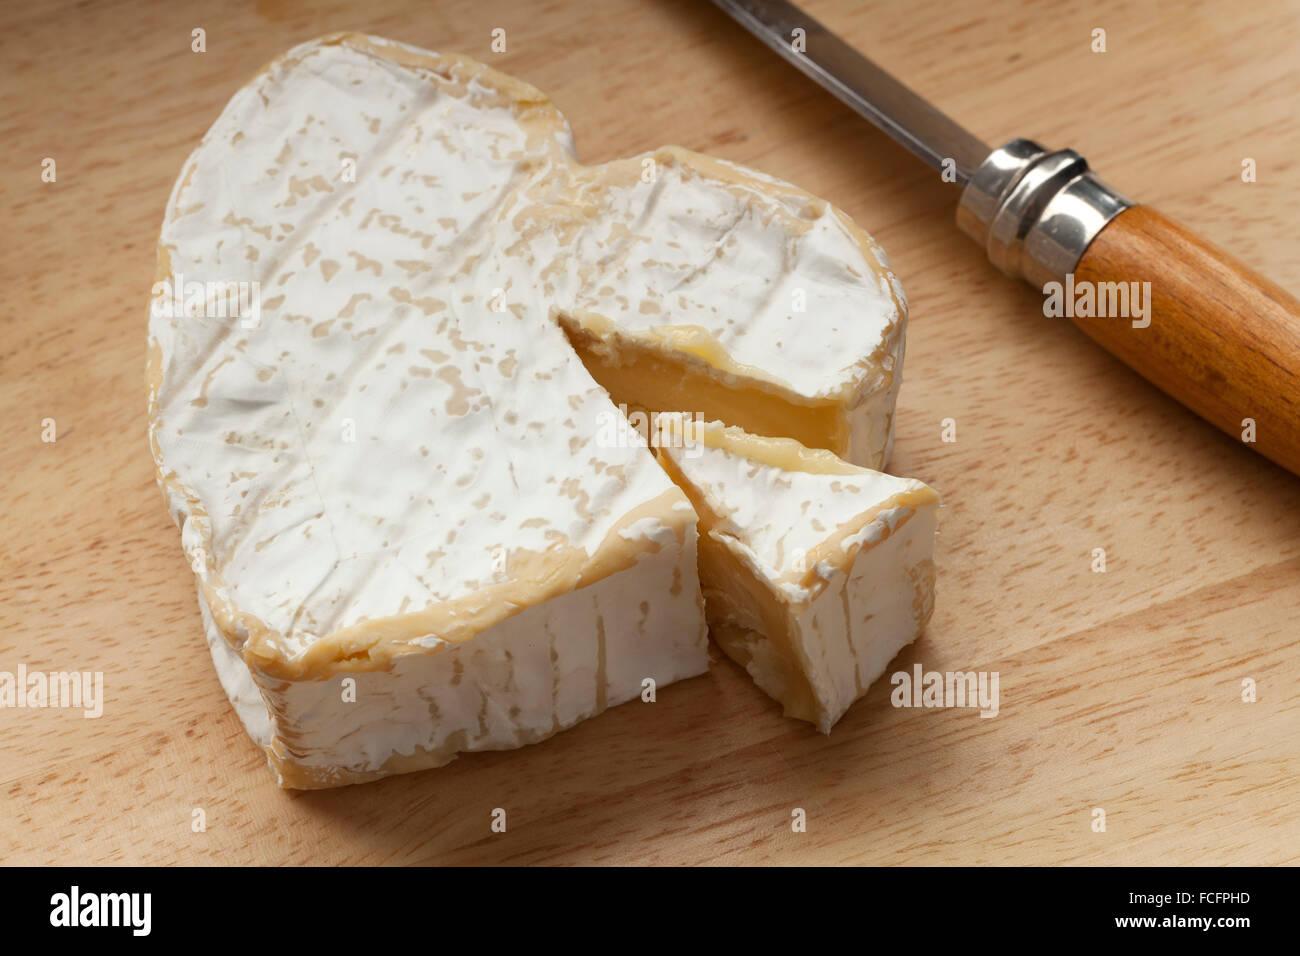 Neuchatel tradicional francesa quesos maduros y una rodaja Imagen De Stock